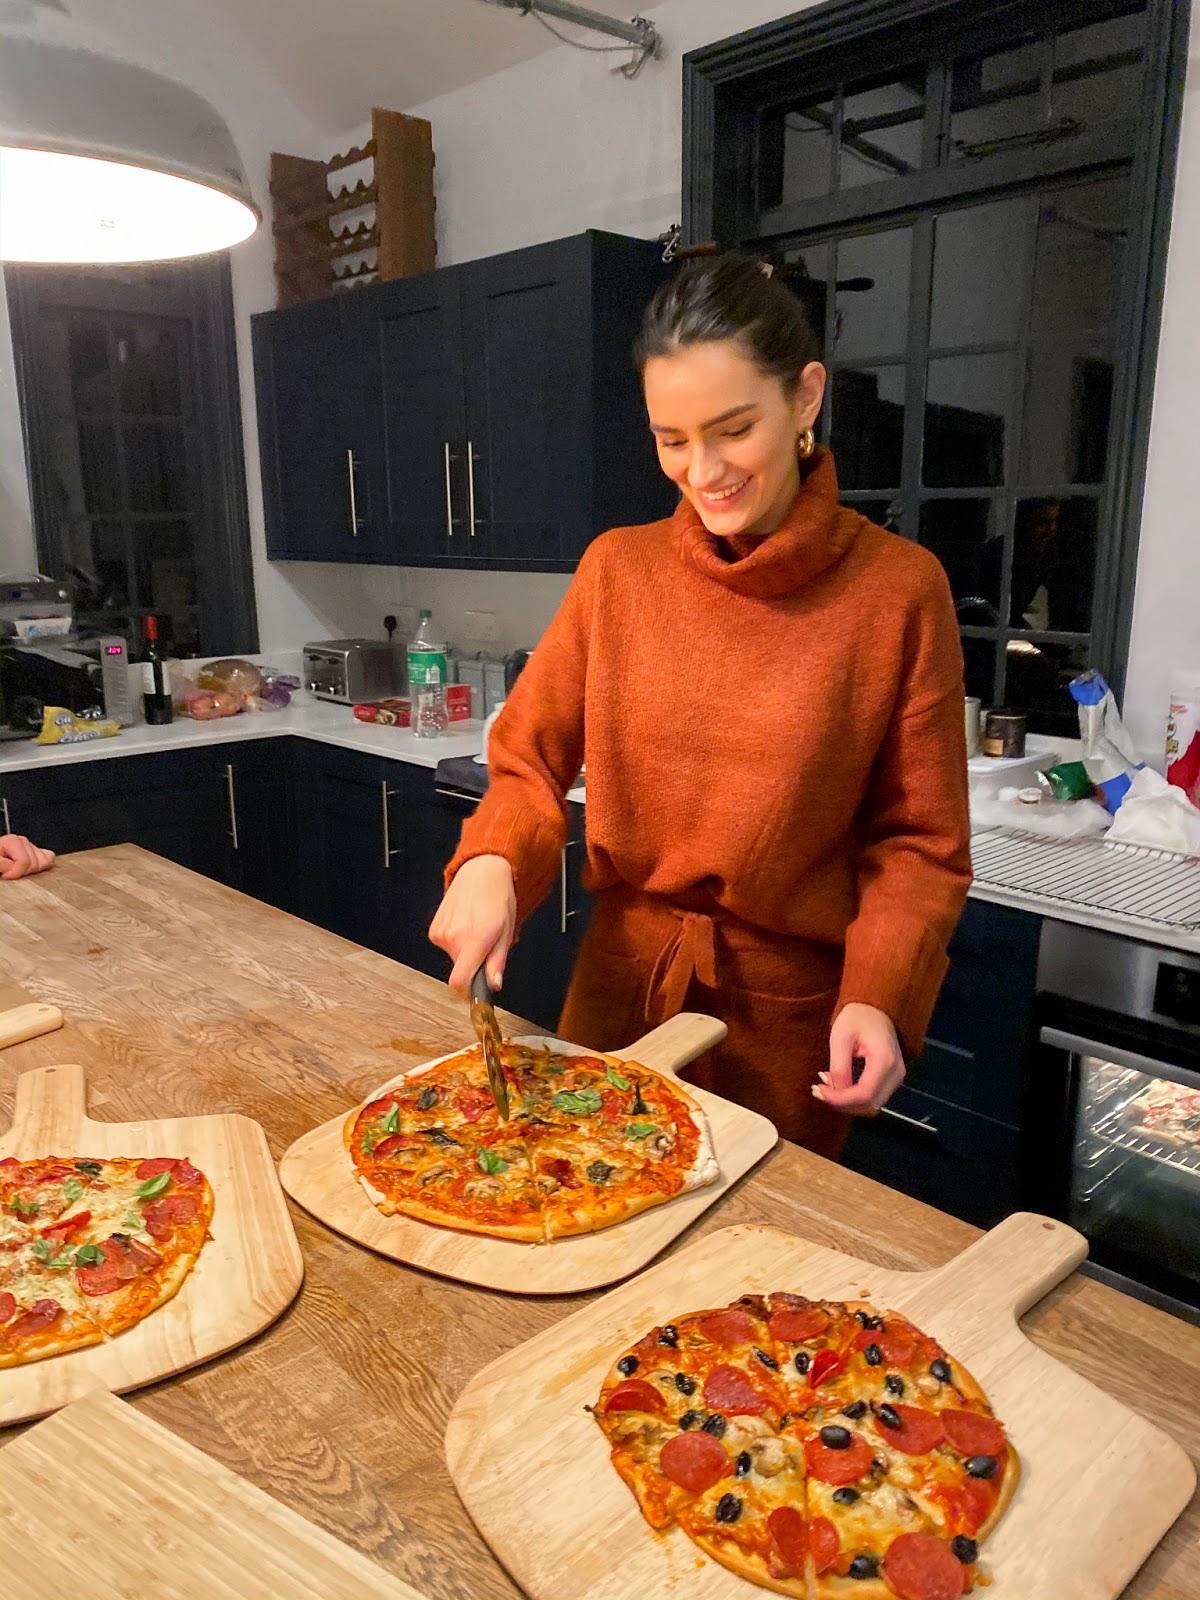 pizza-making-peexo-loungewear